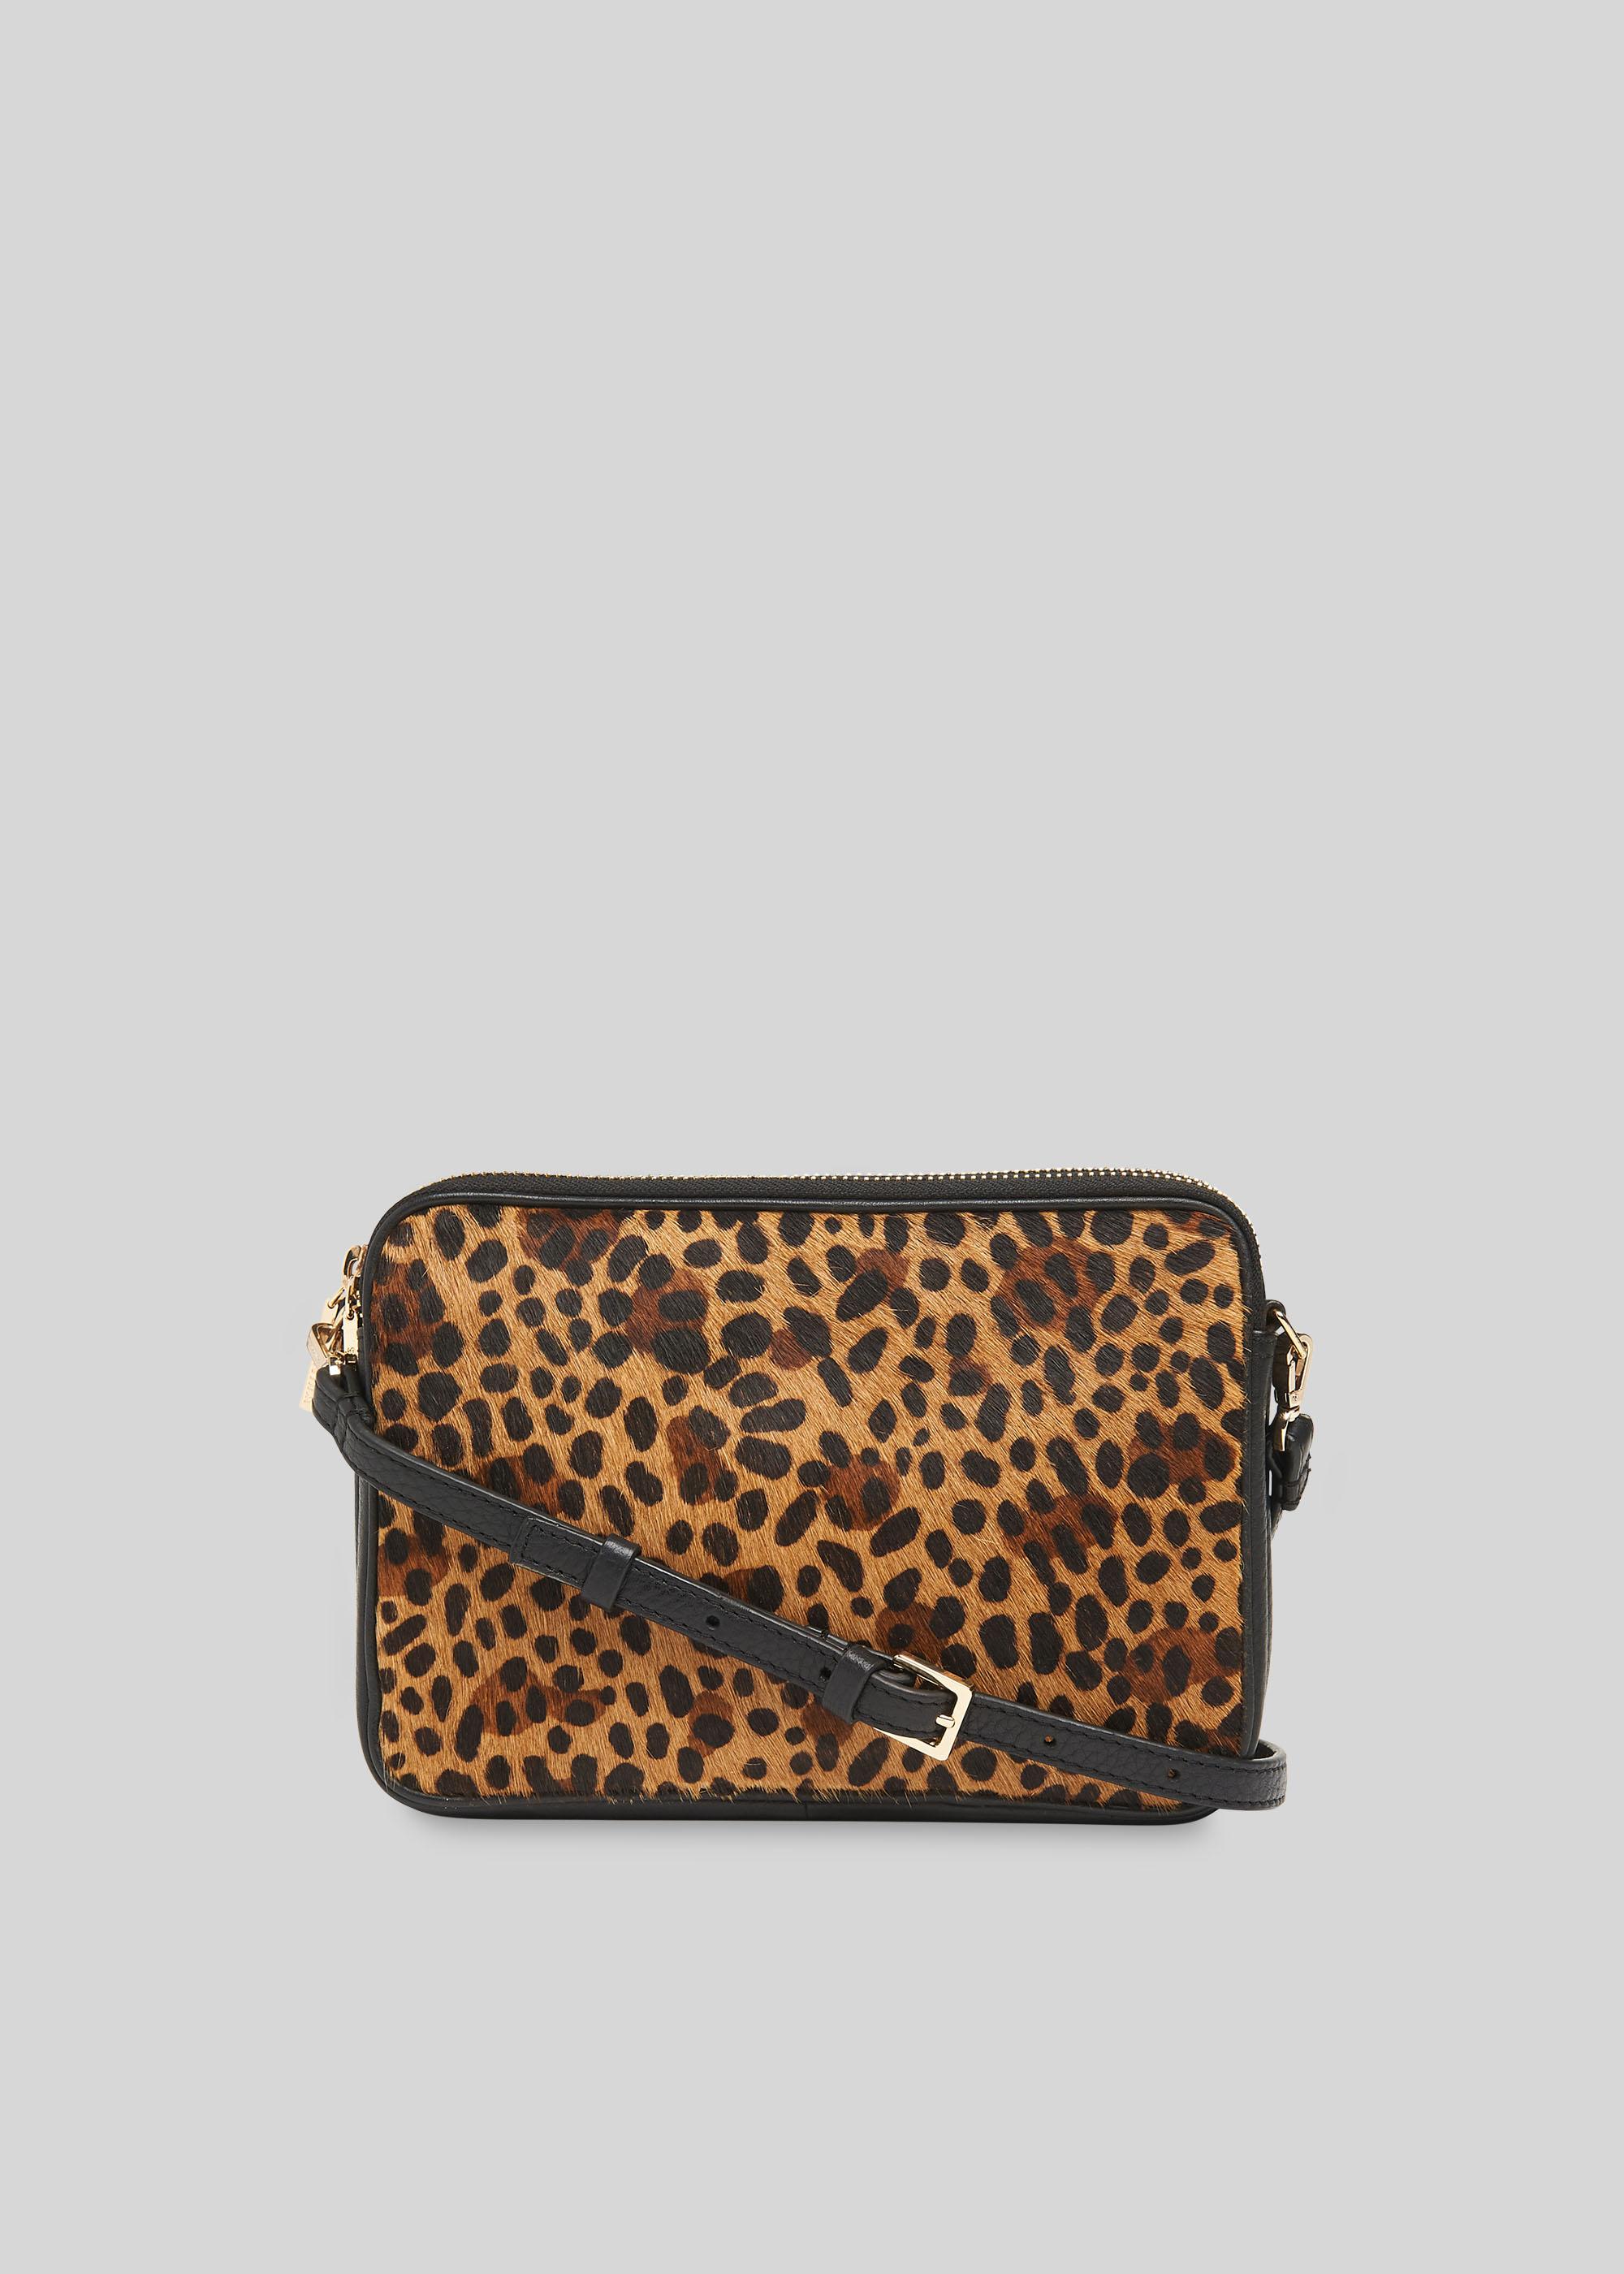 Whistles Women Cami Leopard Crossbody Bag